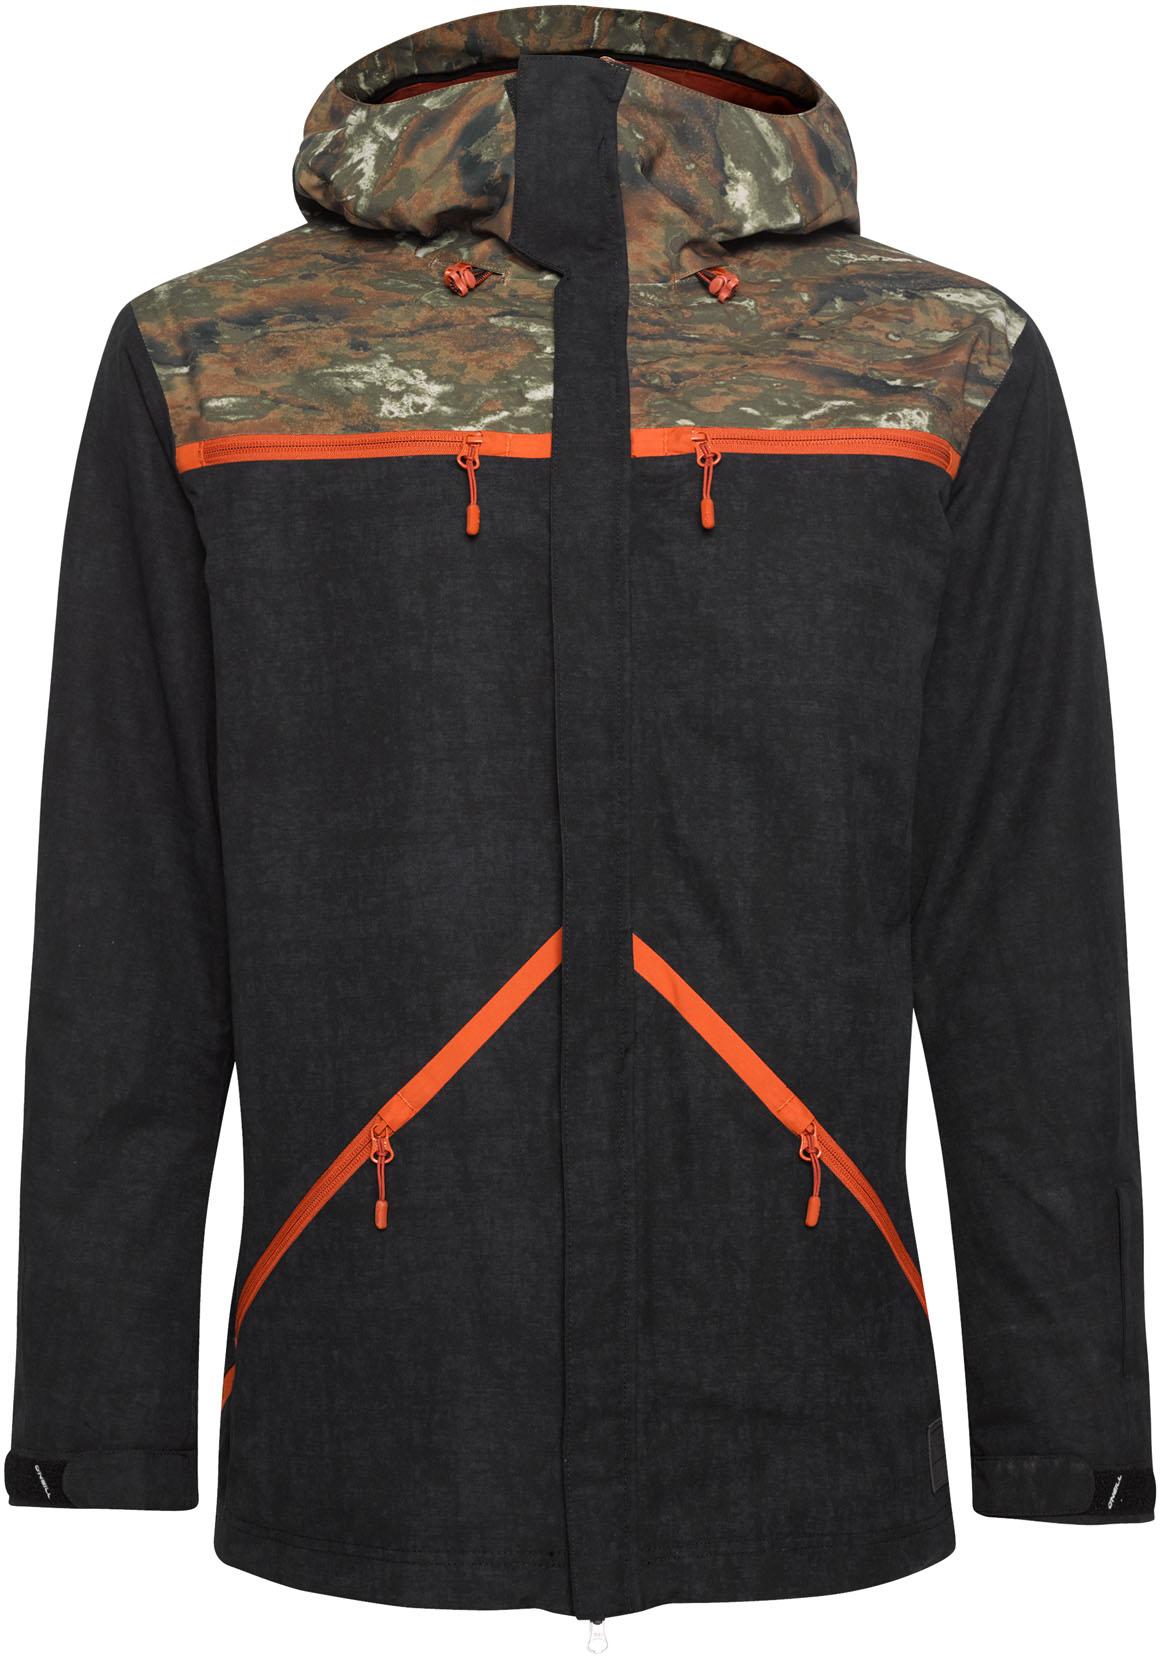 image oneill-quest-jacket-jpg